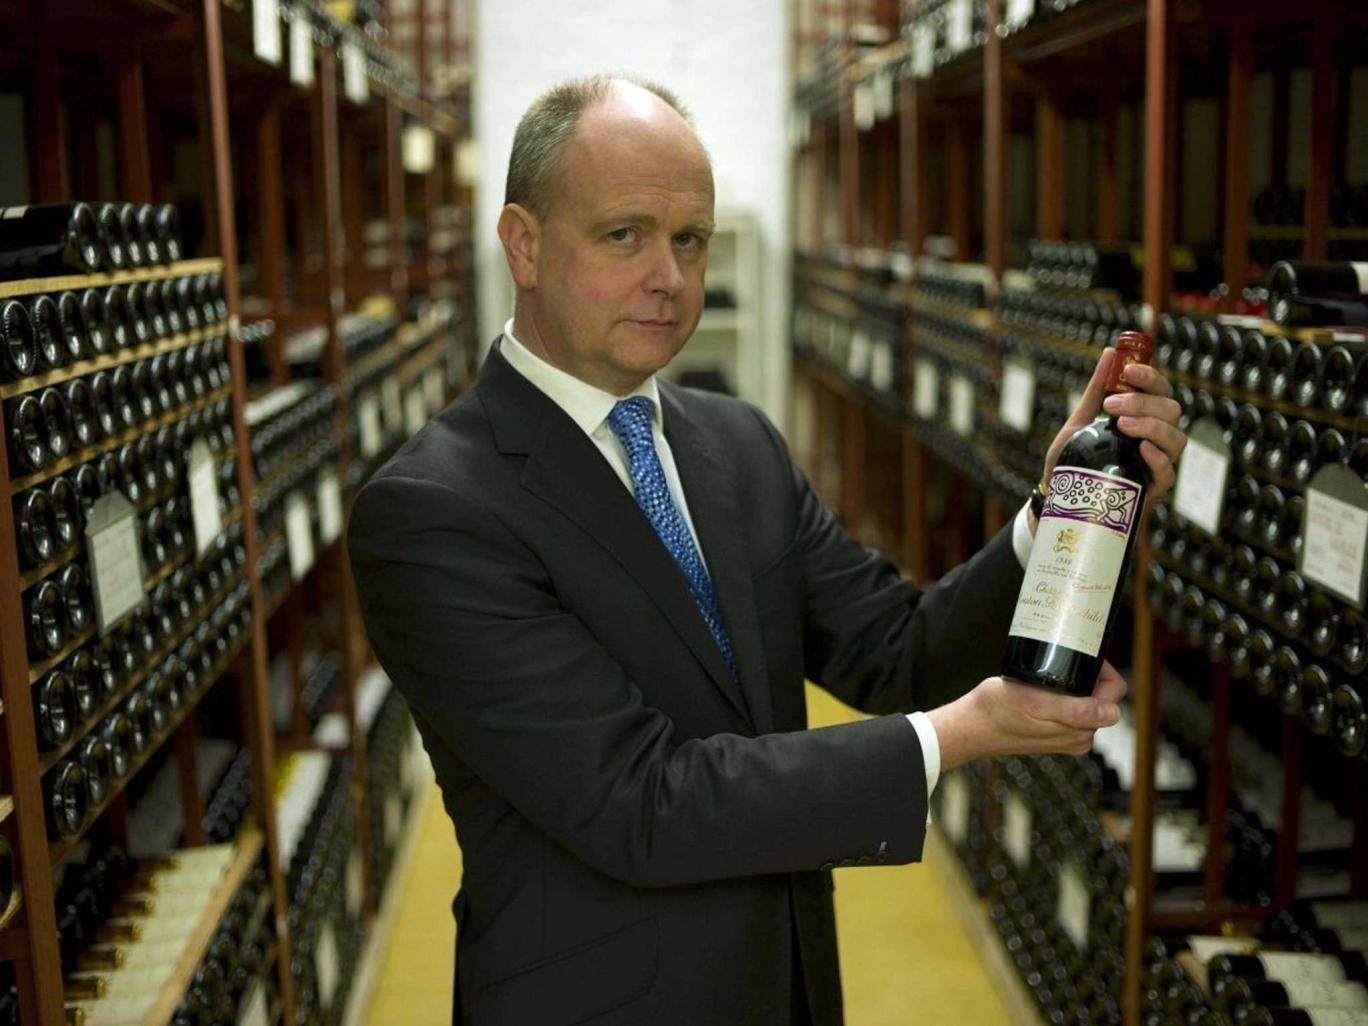 Bottle bank: Robert Alexander, head of government hospitality